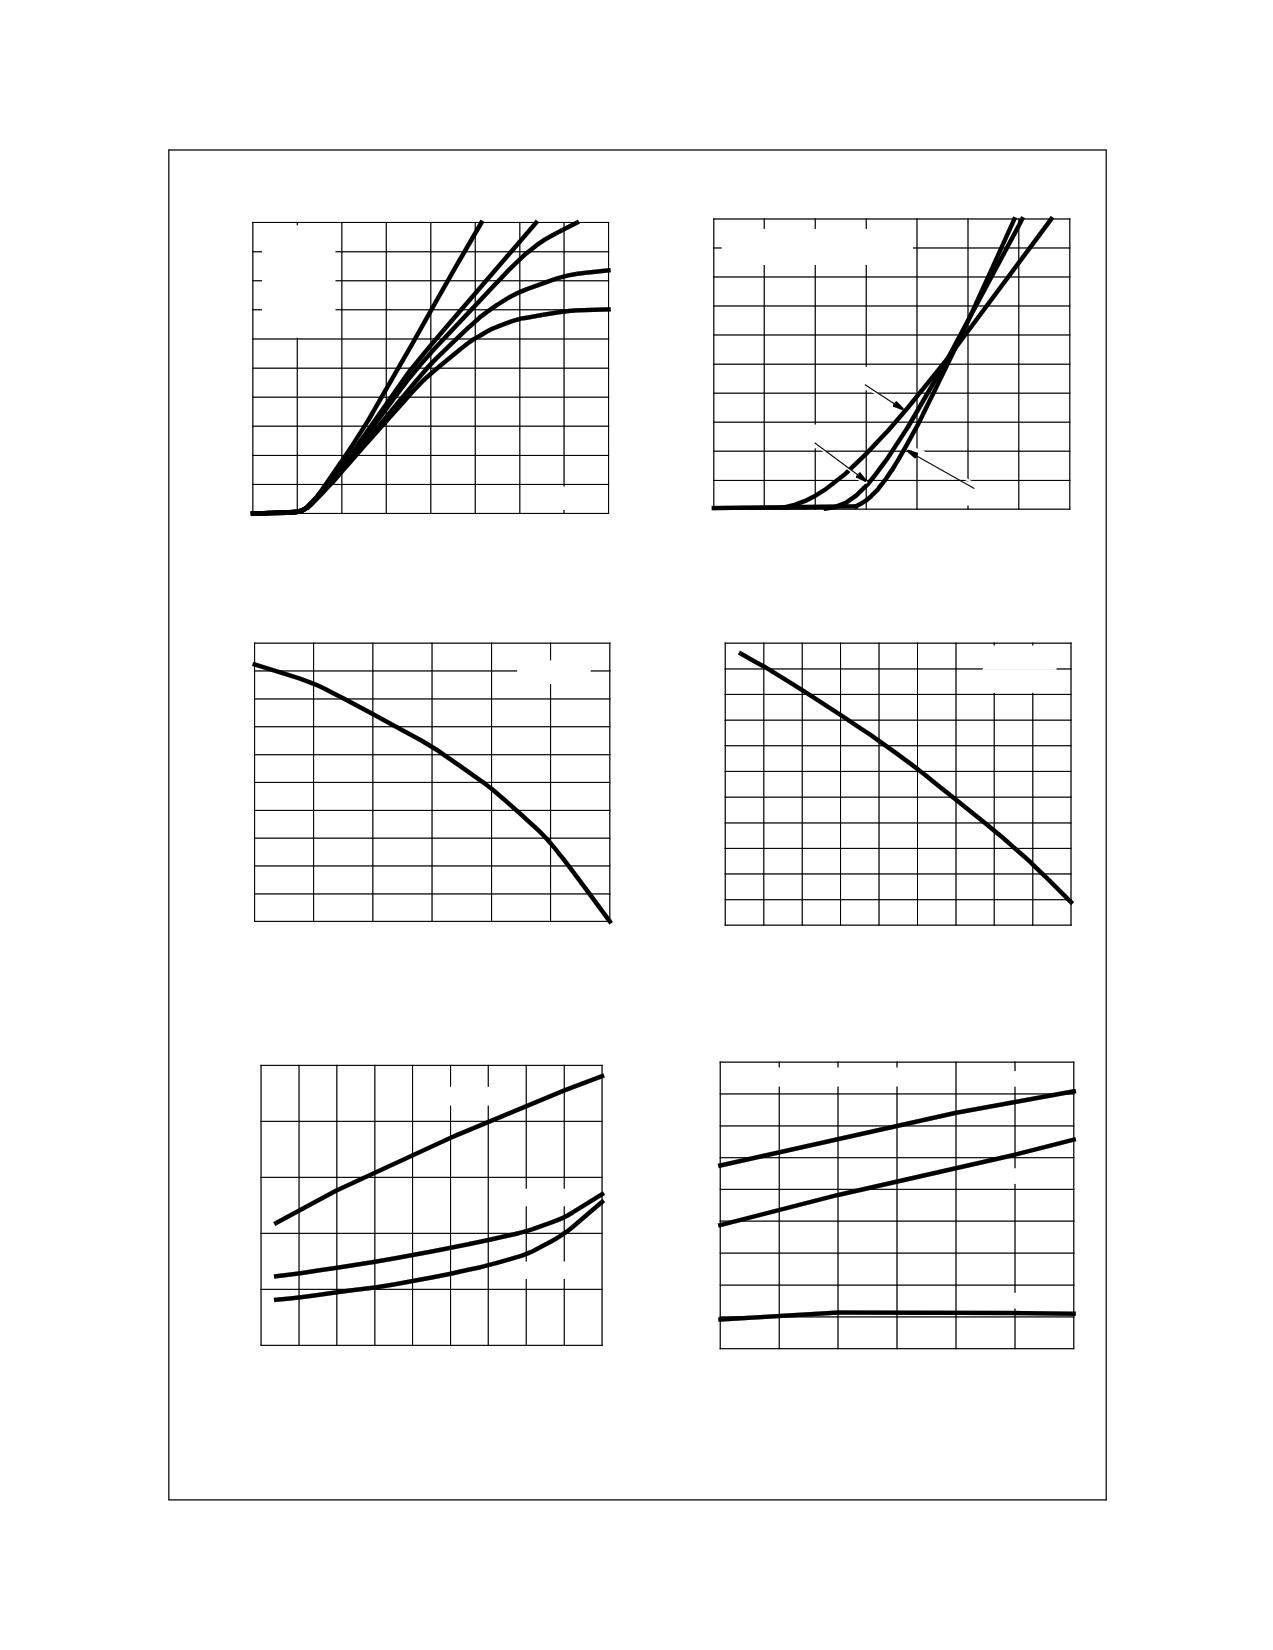 ISL9V5036P3 pdf, 반도체, 판매, 대치품